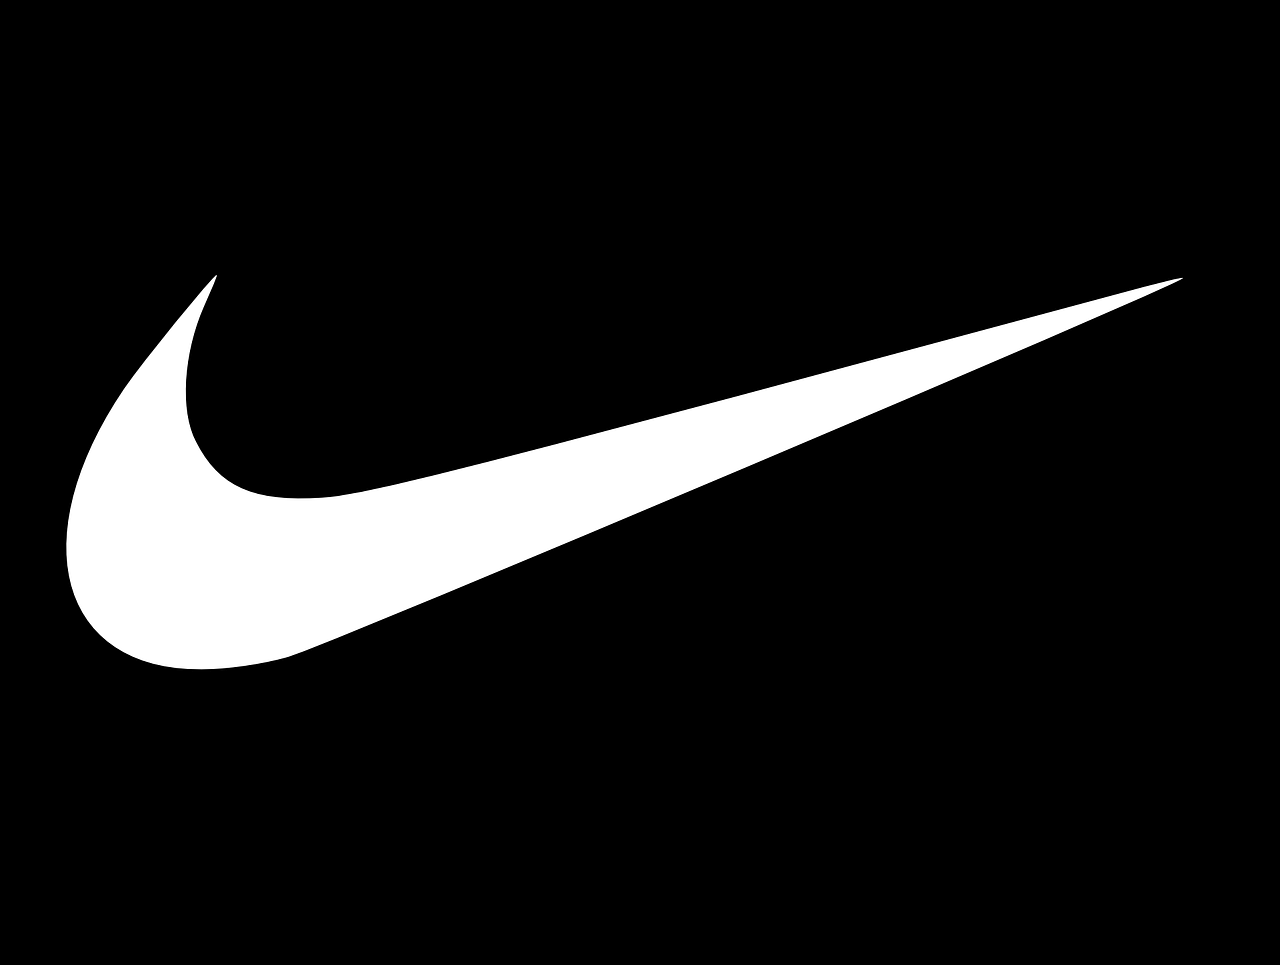 University Student Designed Nike Logo to Pay for School - Nike Logo Design